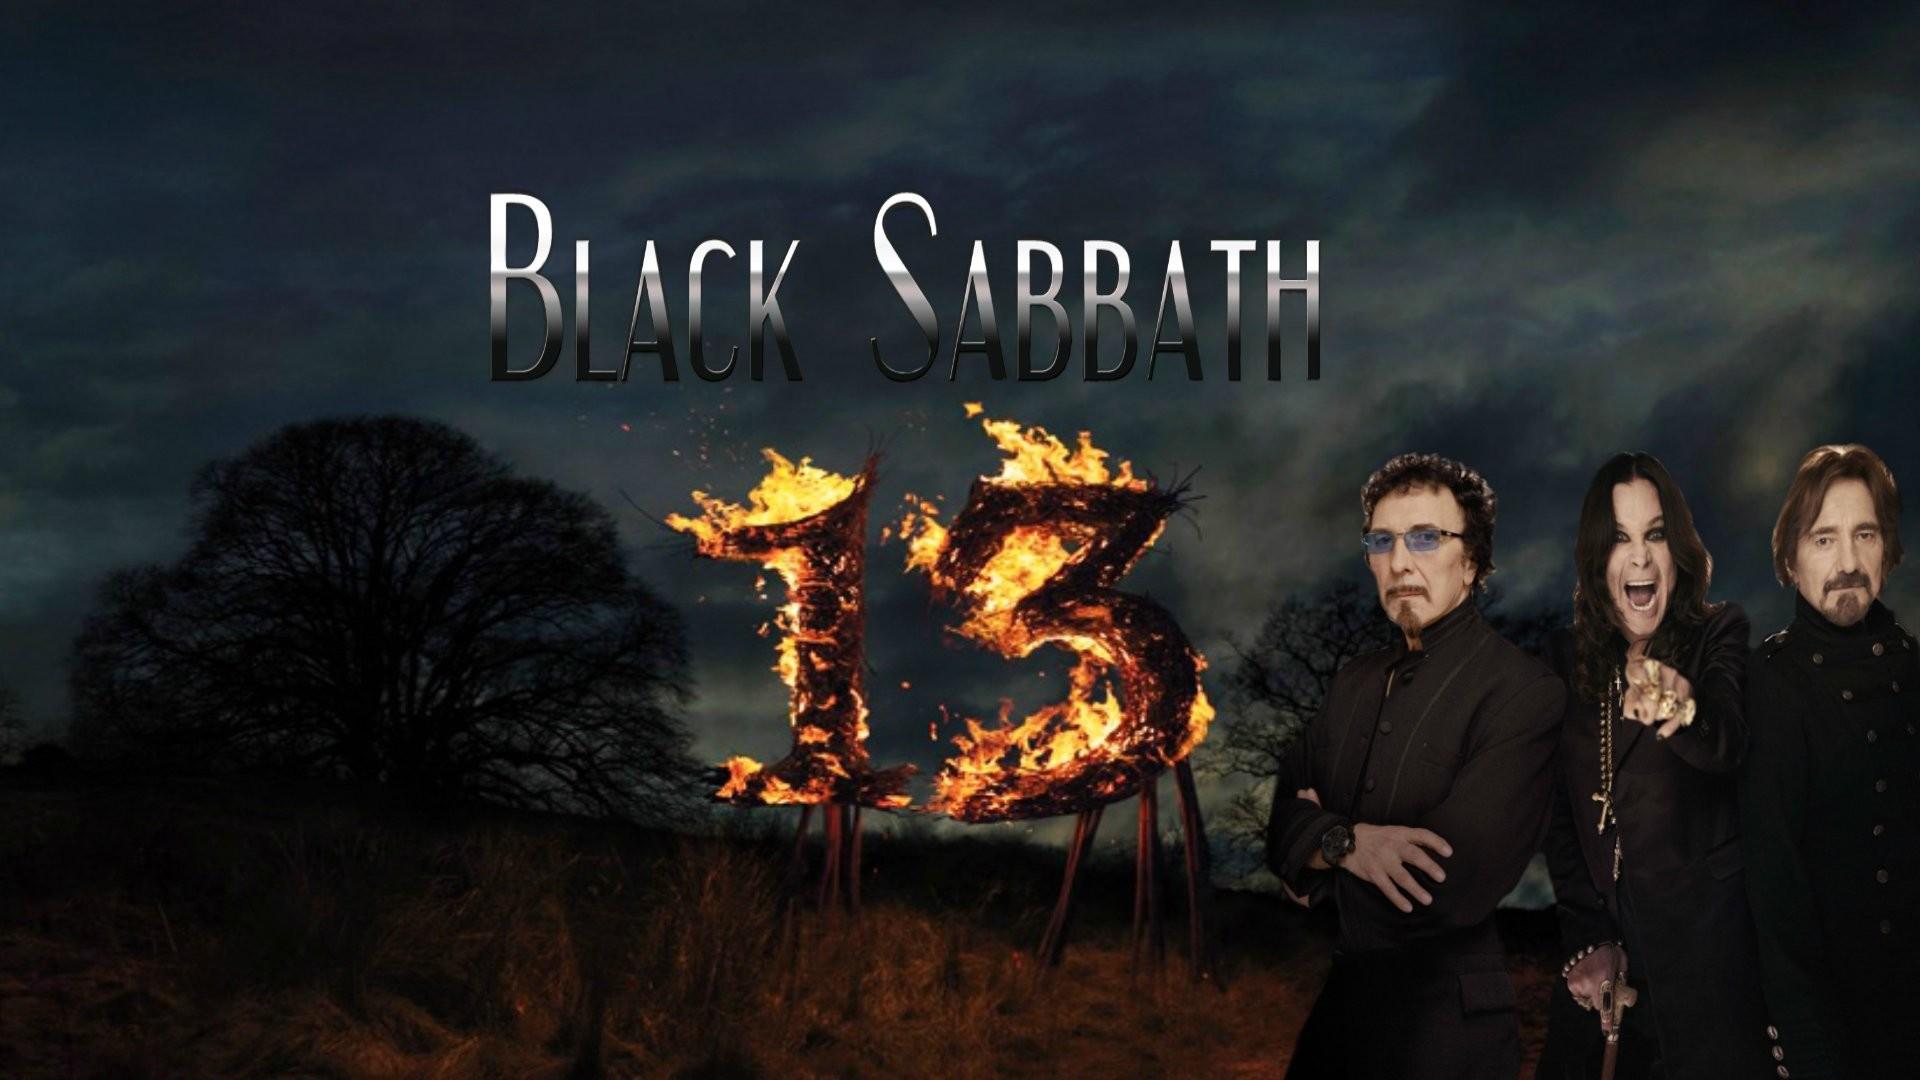 Black sabbath wallpaper 1920x1080